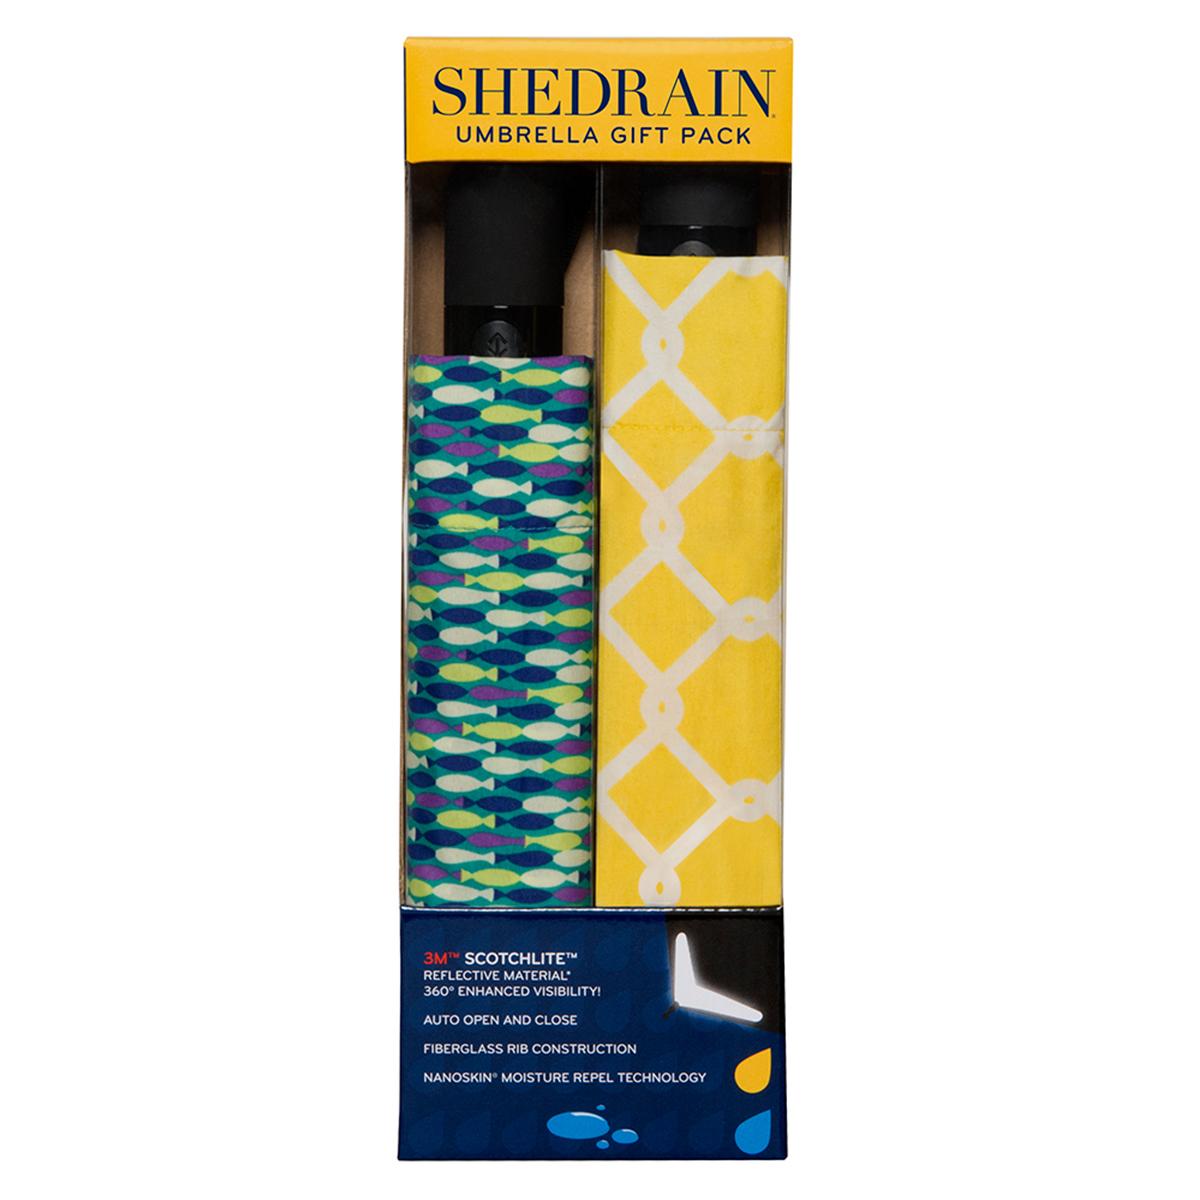 SHEDRAIN自動伸縮雨傘二件組